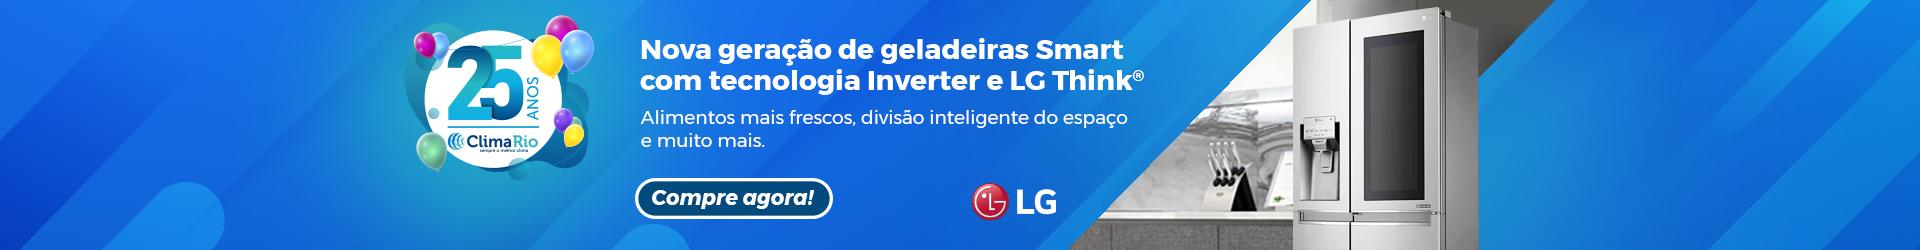 banner_geladeiras_LG_SIDE_BY_SIDE